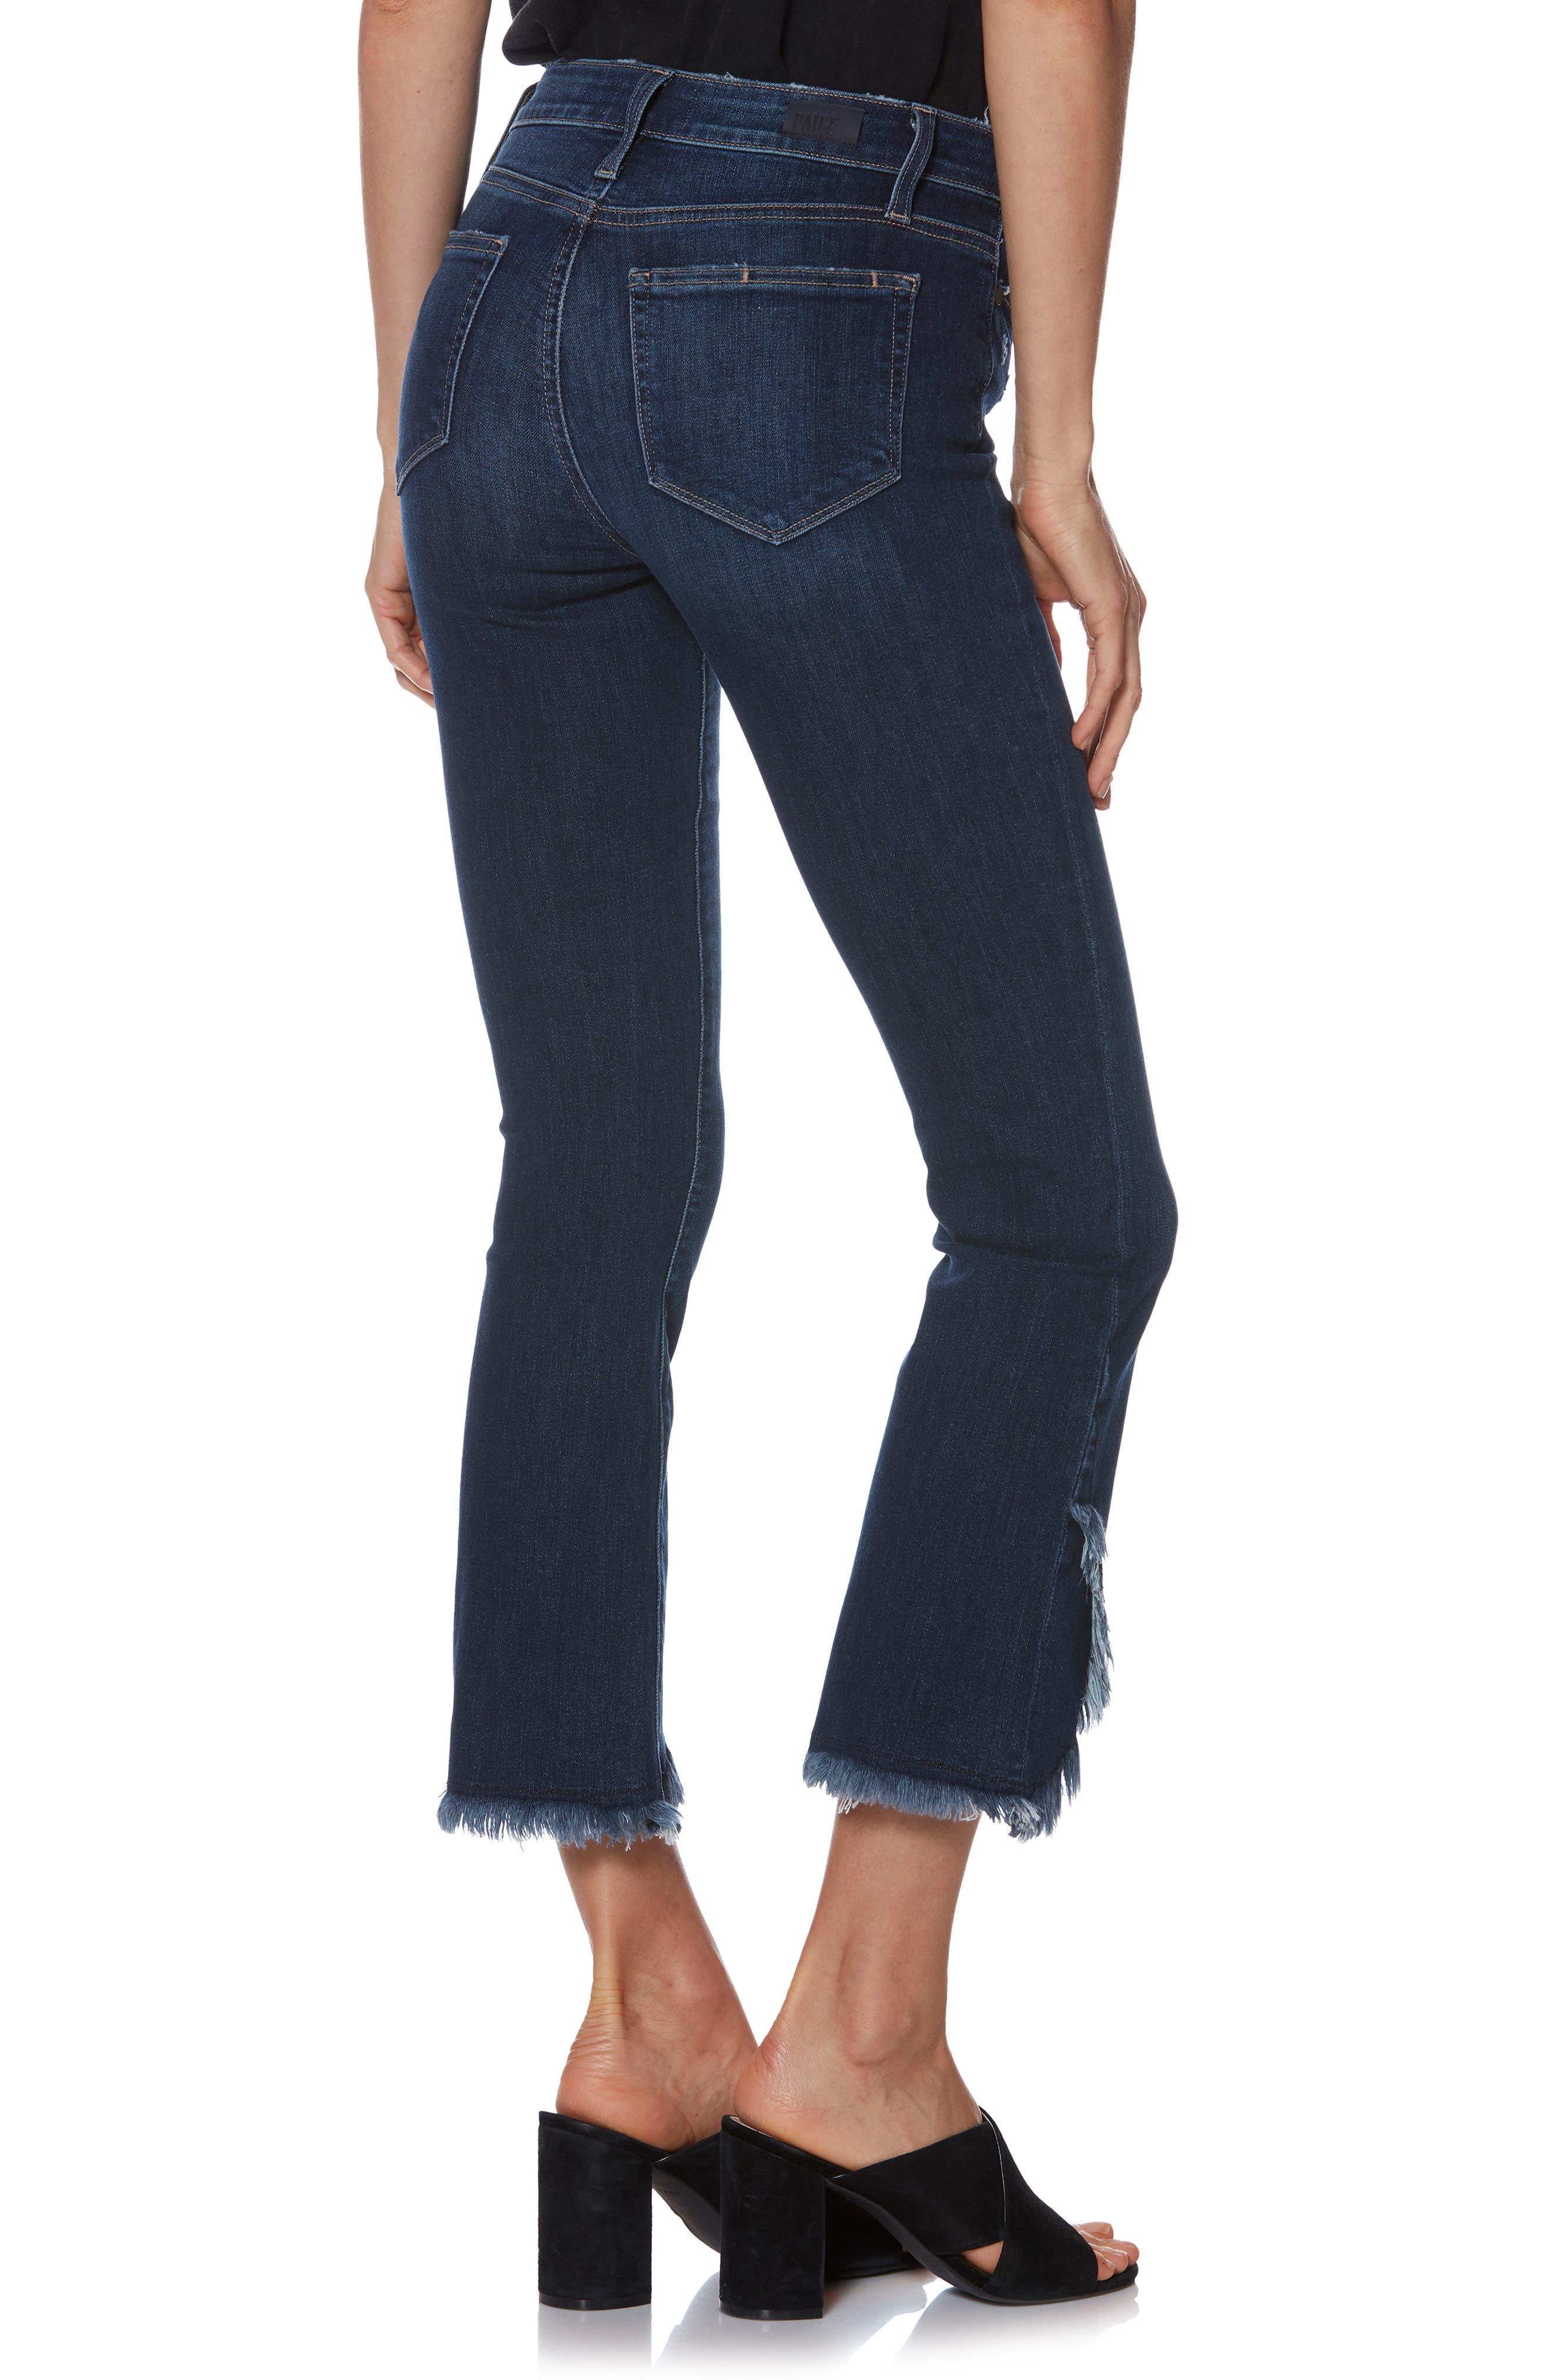 PAIGE,                             Transcend Vintage - Colette Frayed Crop Flare Jeans,                             Alternate thumbnail 2, color,                             PALMA